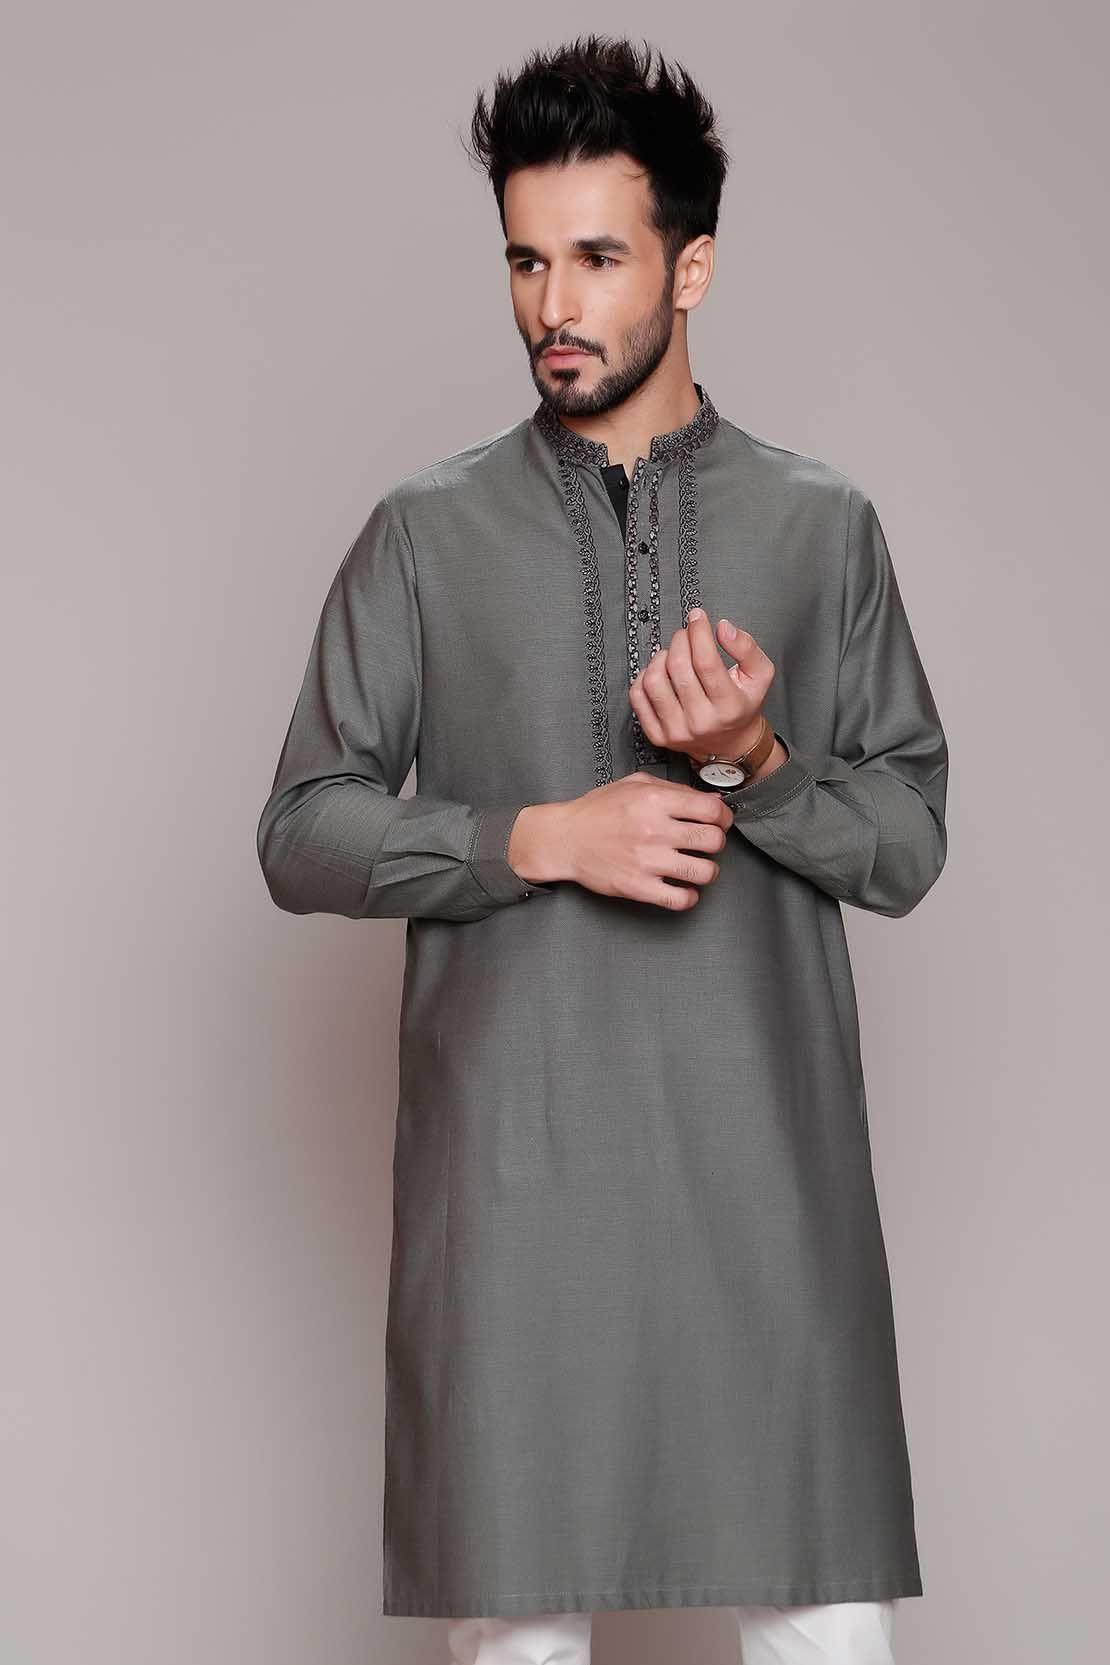 2b59a57a2 Latest Men Modern Kurta Styles Designs Collection 2018-19 by ...